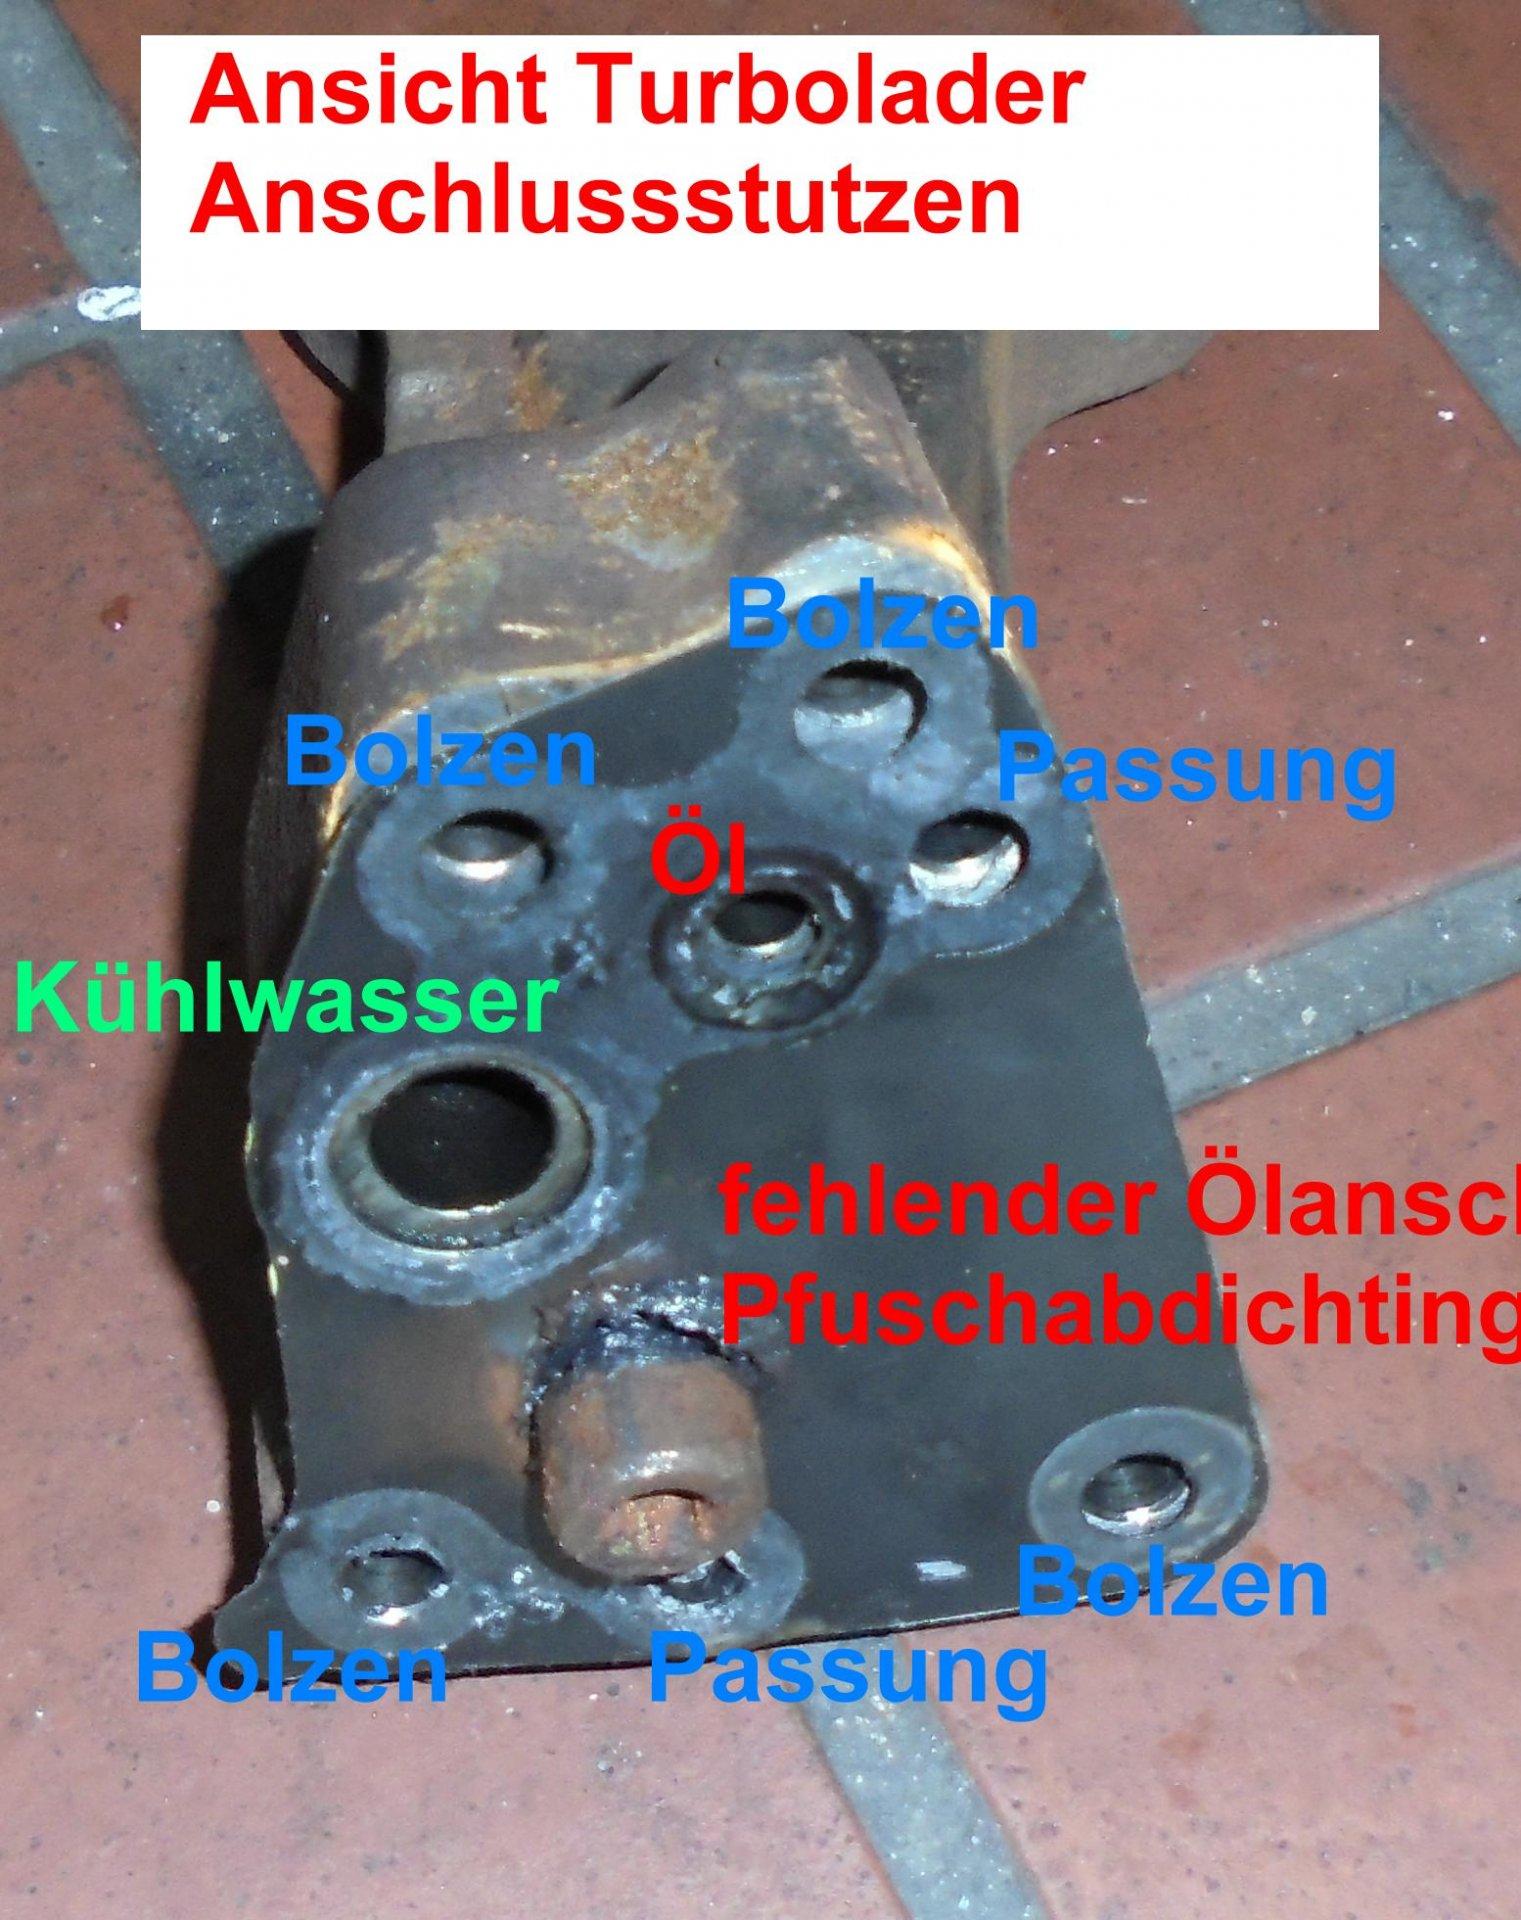 E-Klasse Turboladerstutzen.jpg